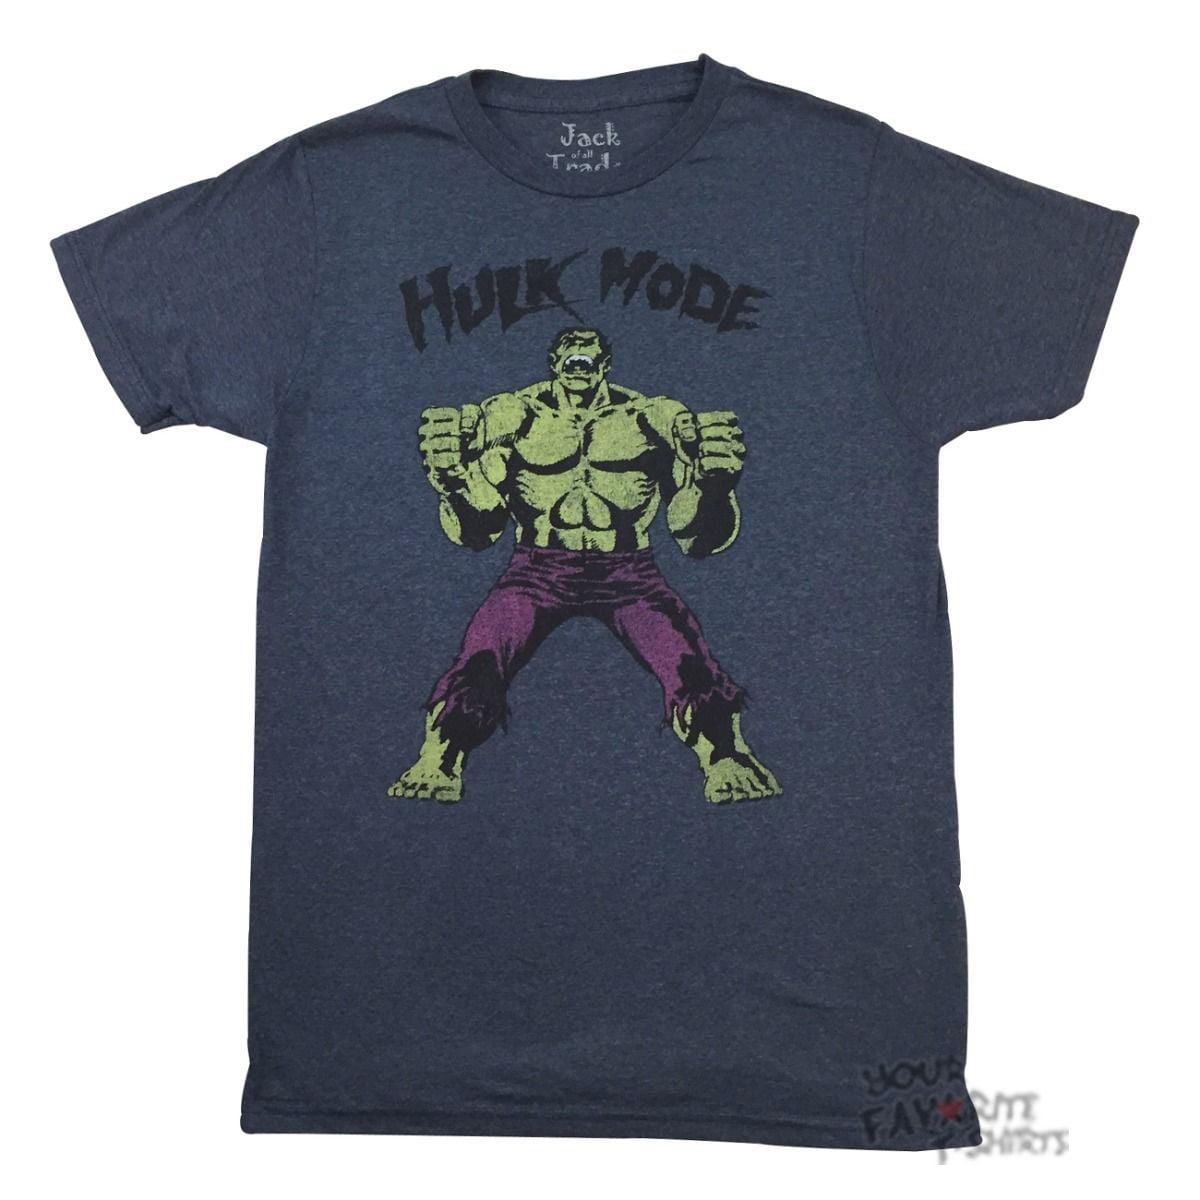 Hulk Mode Marvel Comics Adult T-Shirt